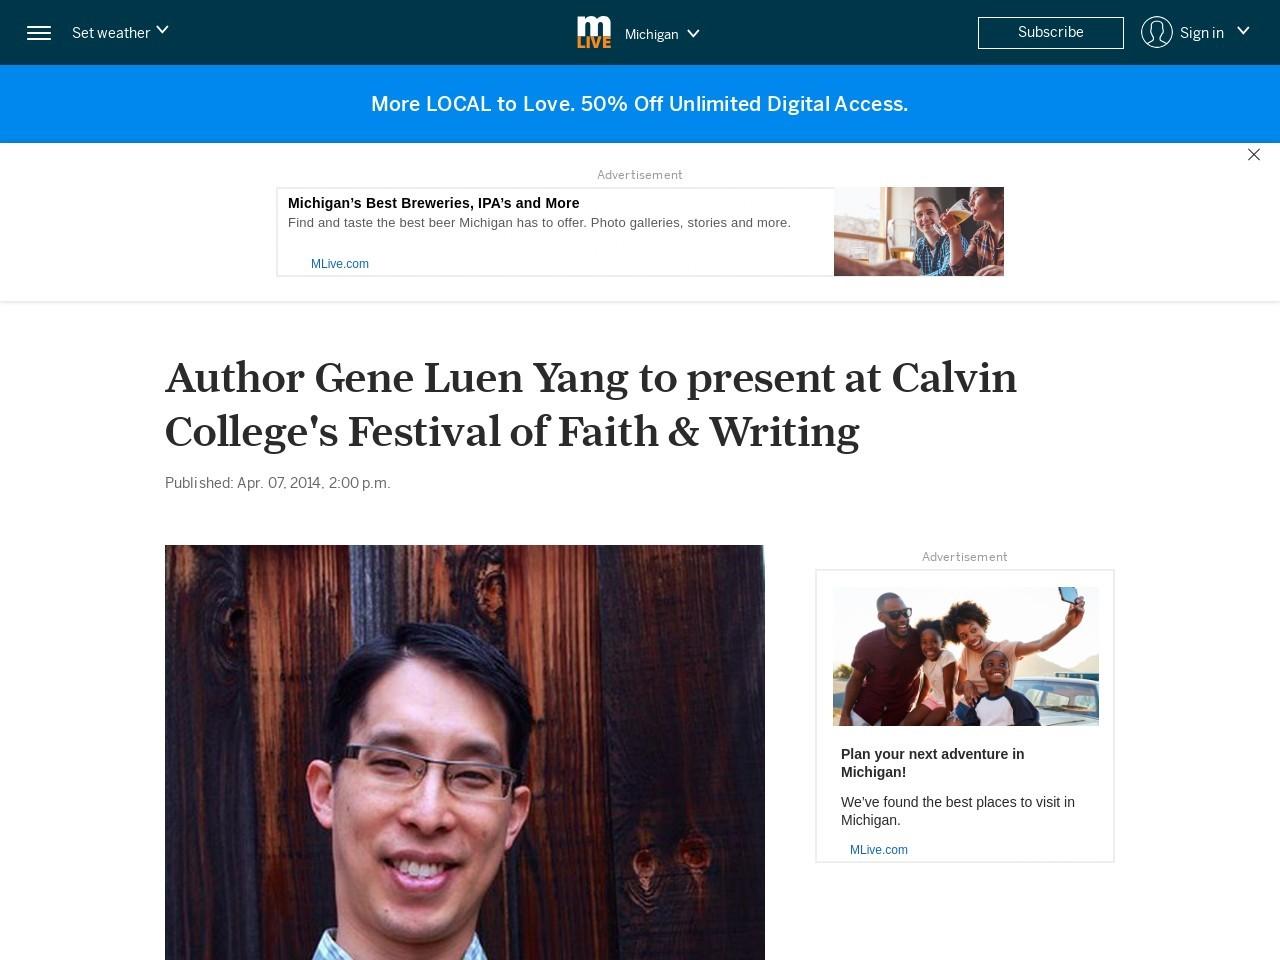 Author Gene Luen Yang to present at Calvin College's Festival of Faith & Writing